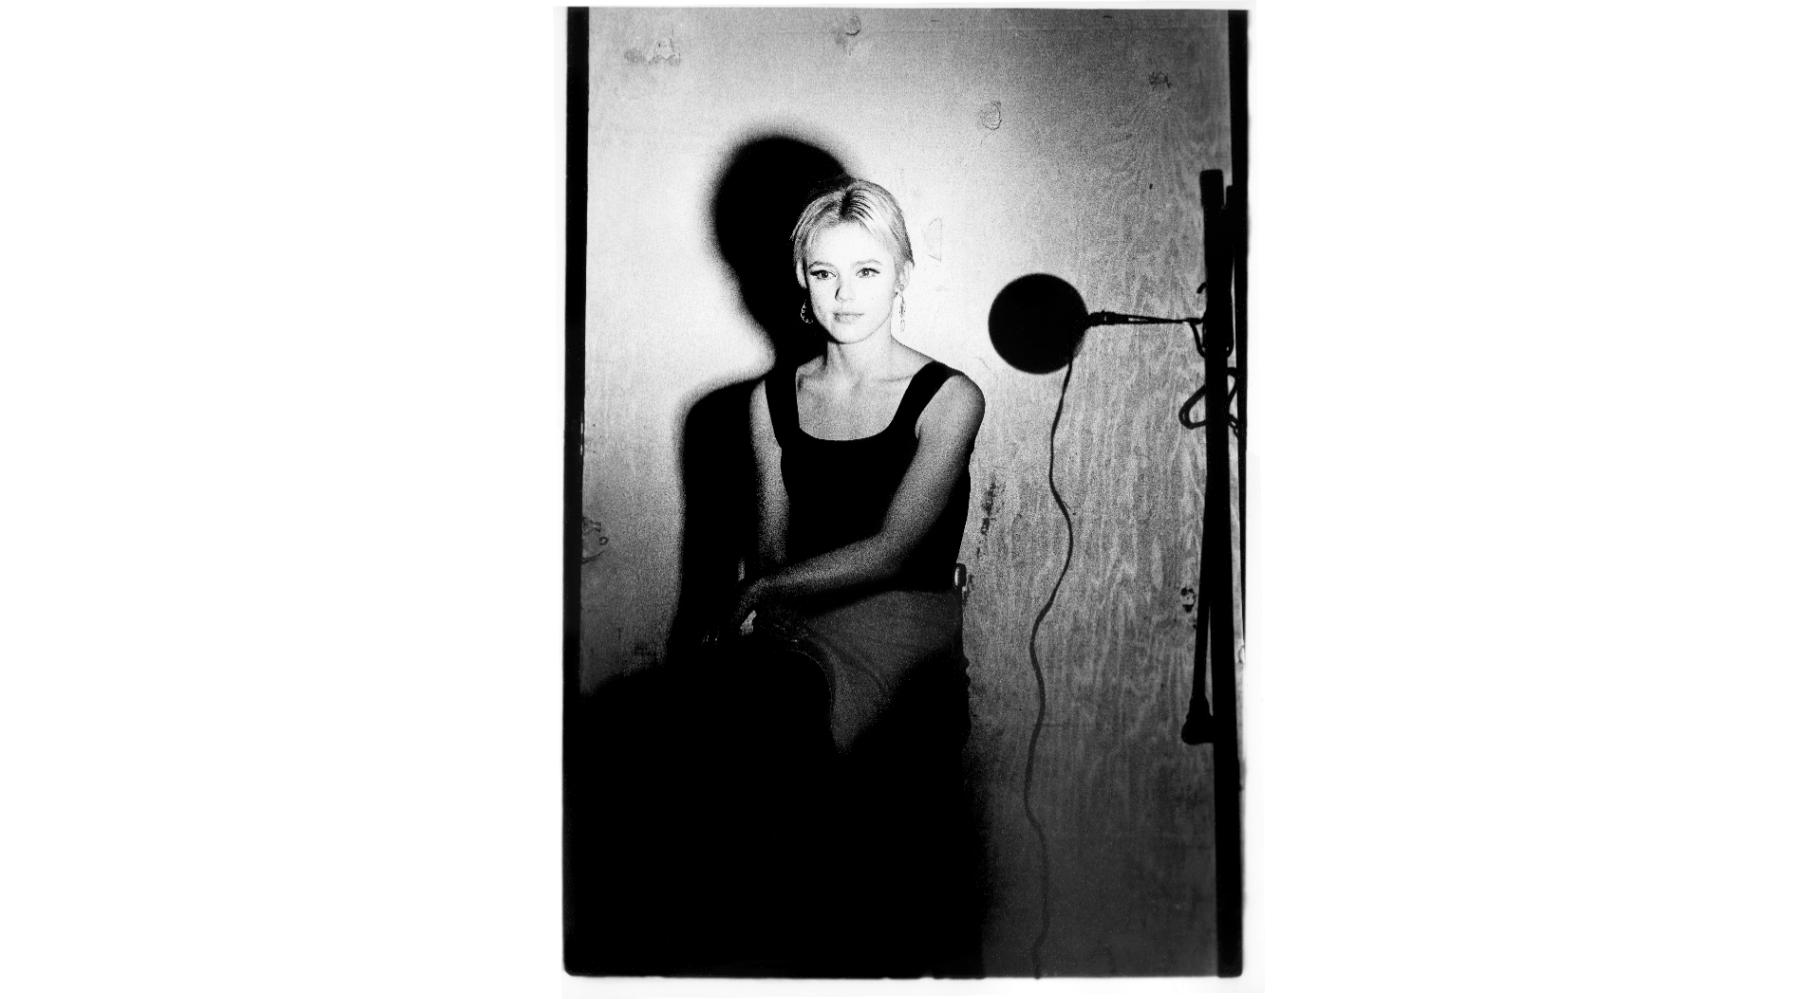 'Edie Sedgwick Screen Test', 1965